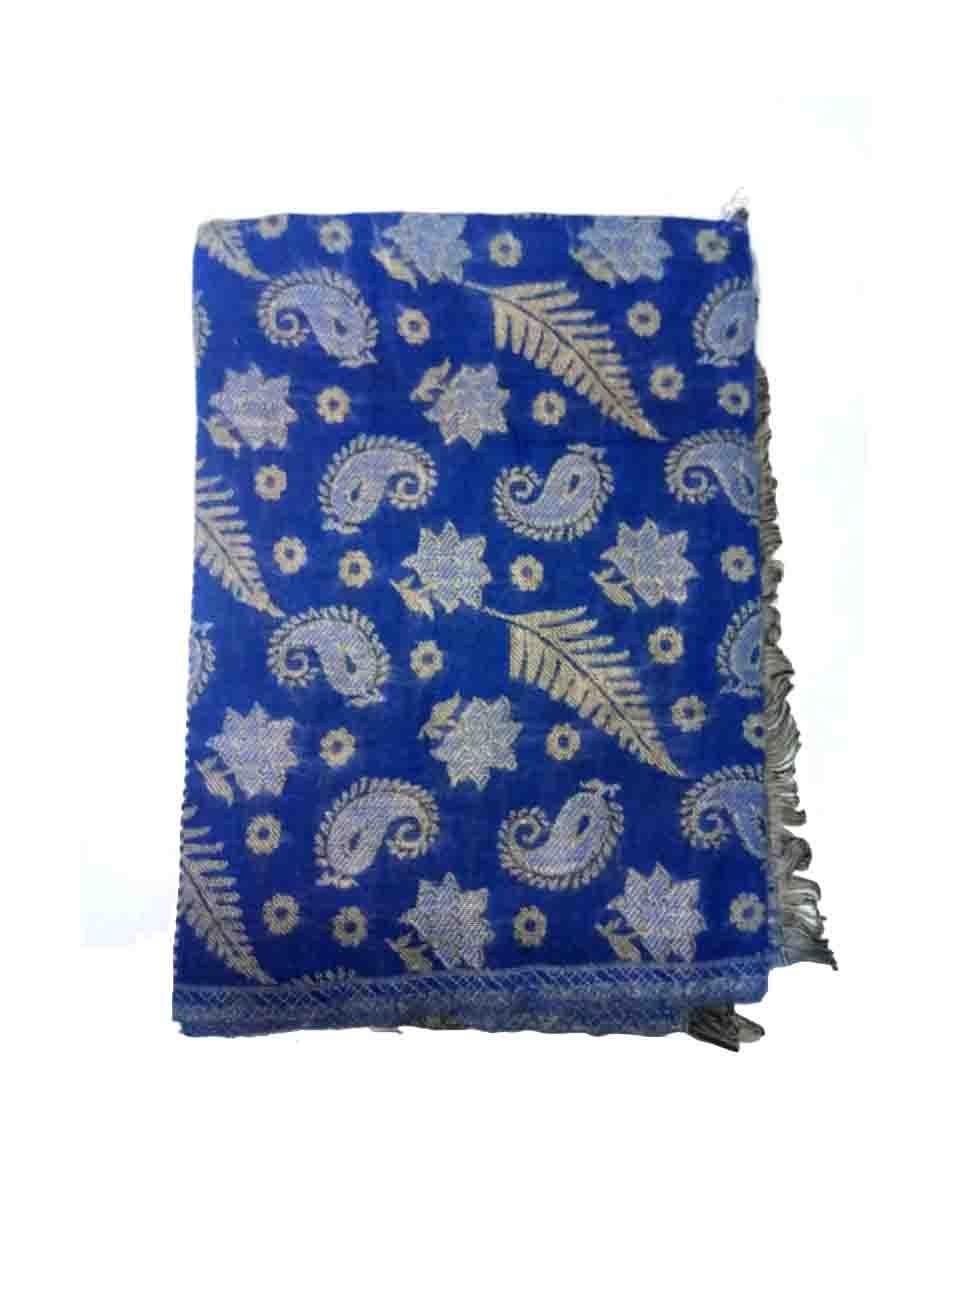 WOMEN SHAWL-BLUE-WSWL 165 D NO 1